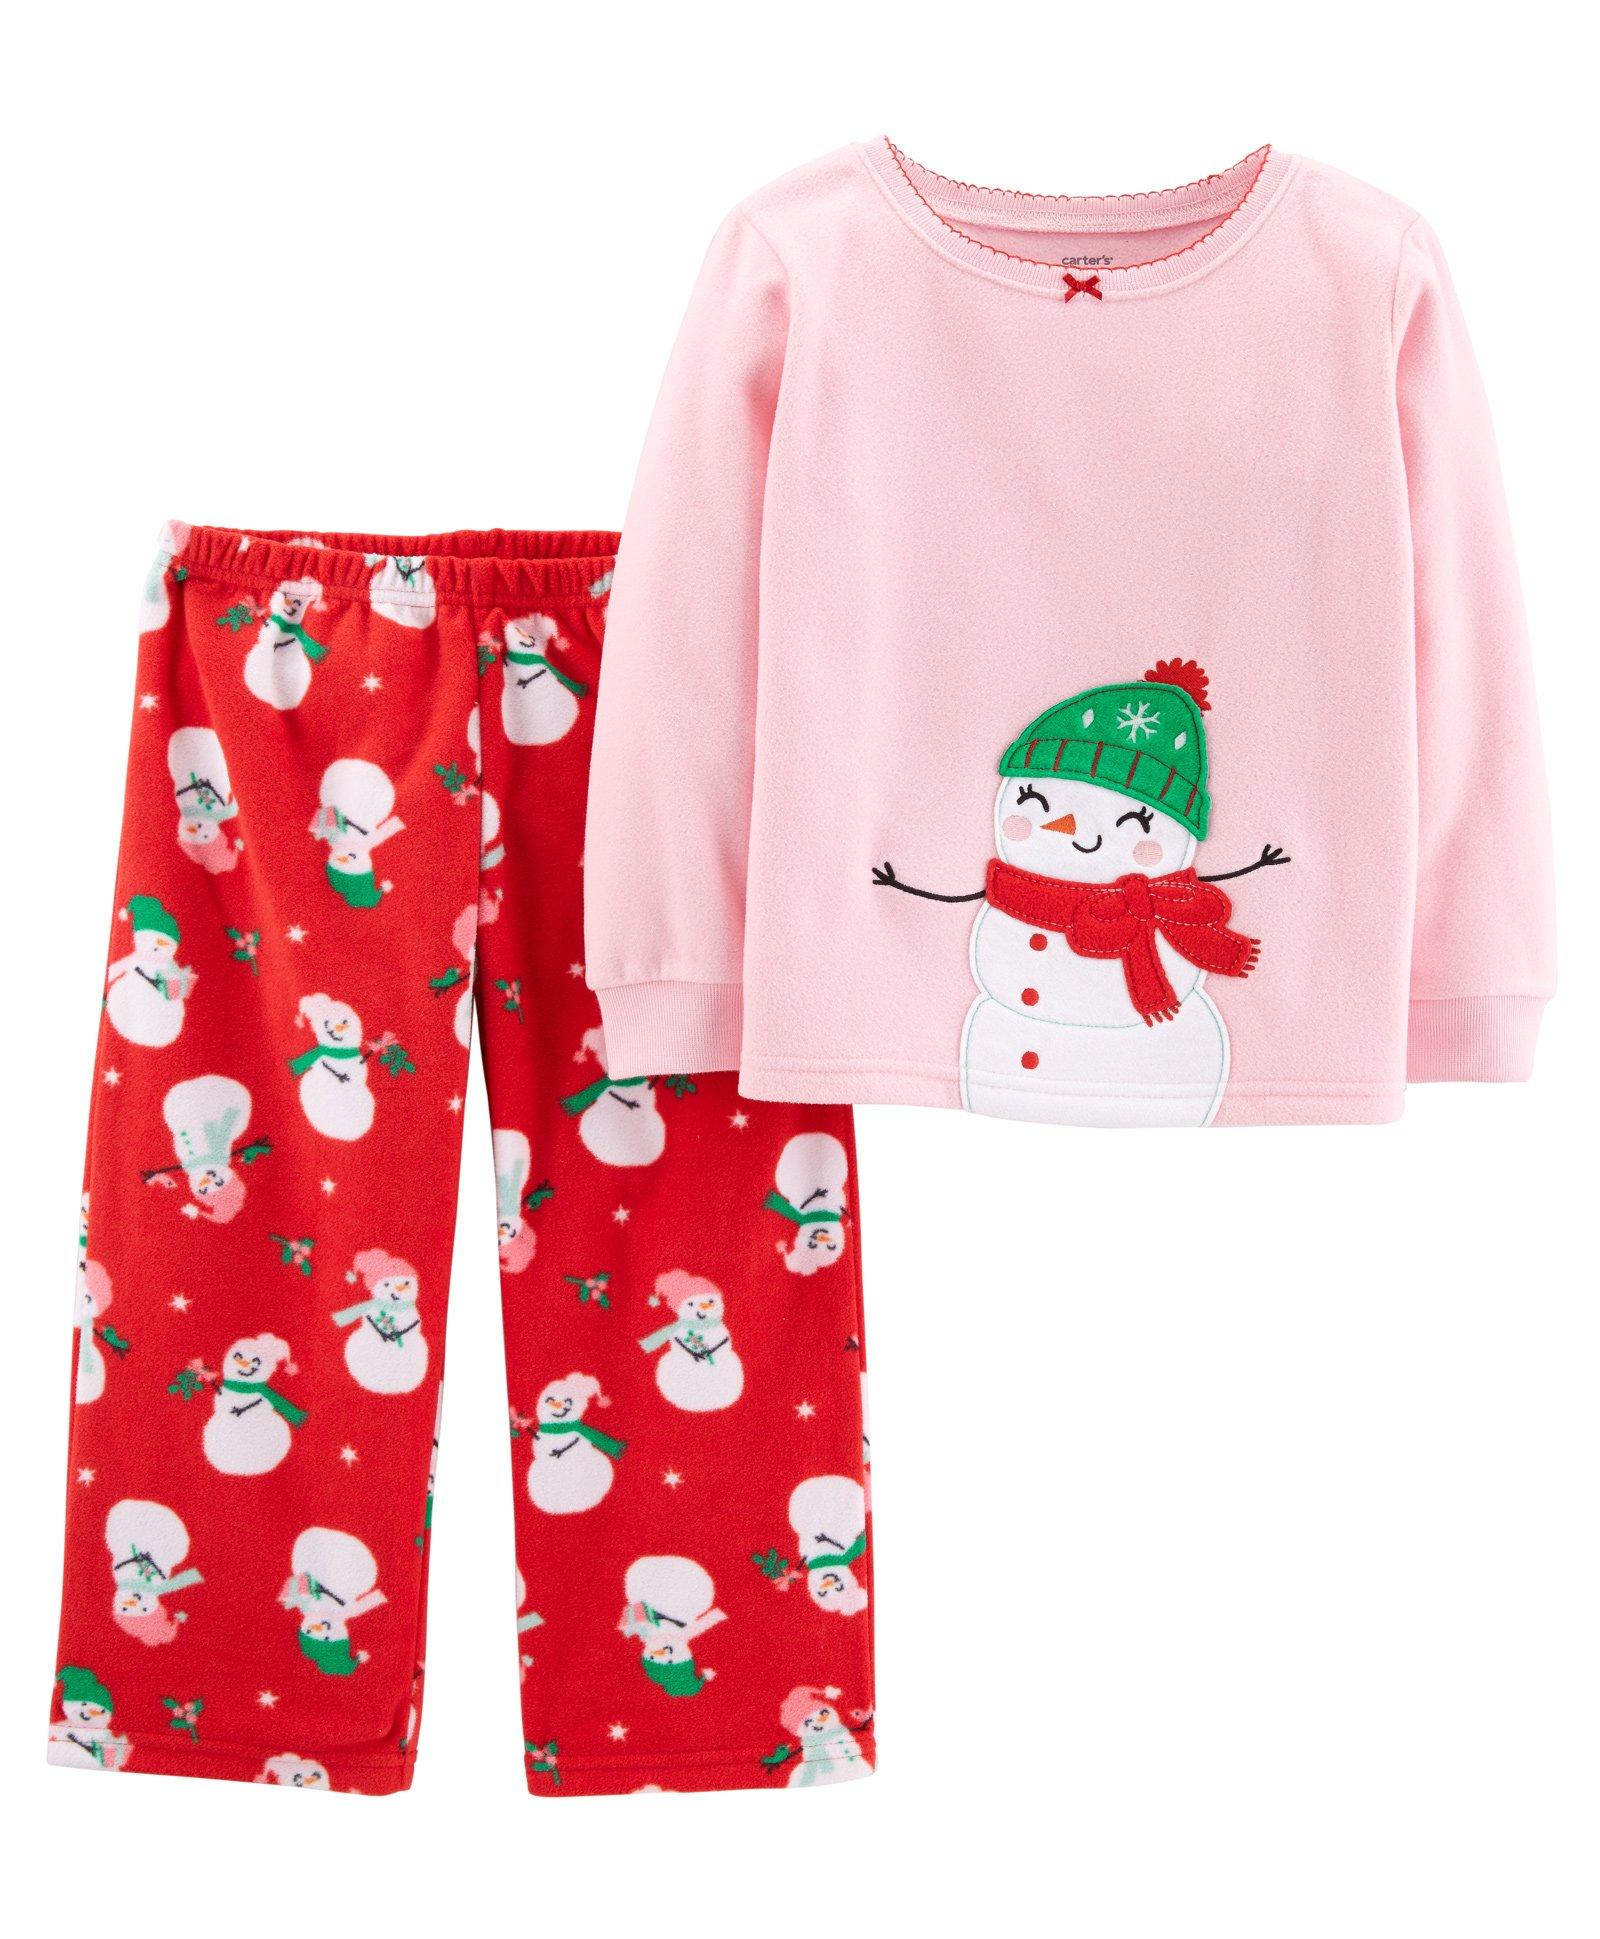 a9e8f0414 Buy Carters 2Piece Christmas Snowman Fleece Pajama Pink & Red ...